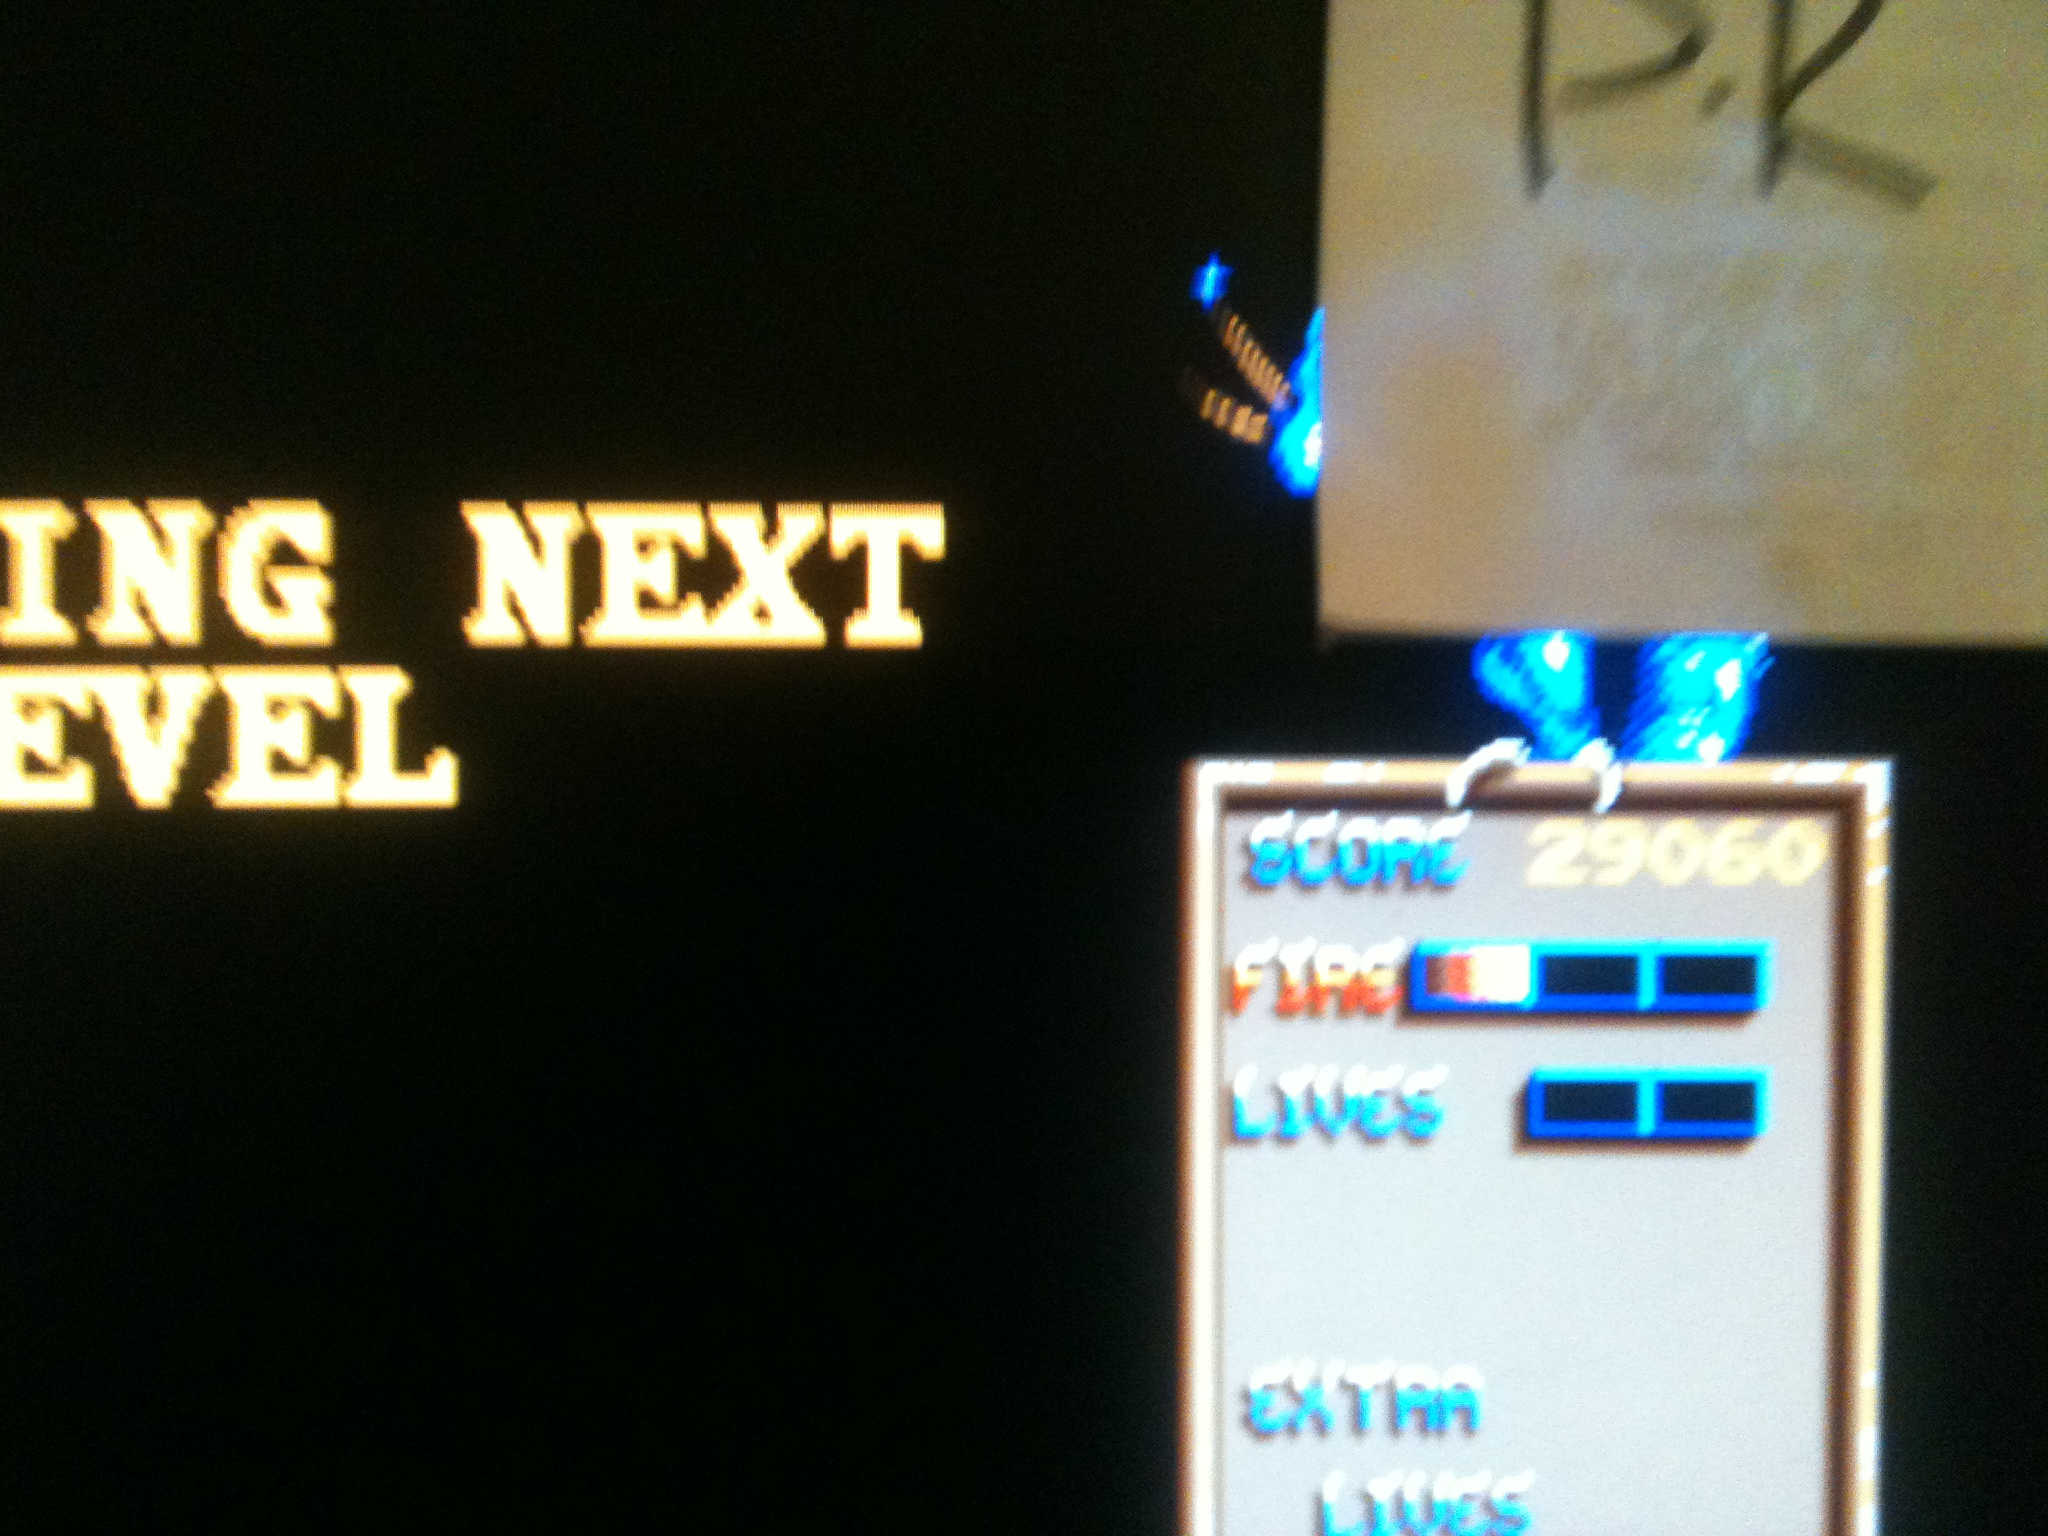 kernzy: Dragon Spirit [Normal/F2] (Atari ST Emulated) 29,060 points on 2015-02-17 21:37:59